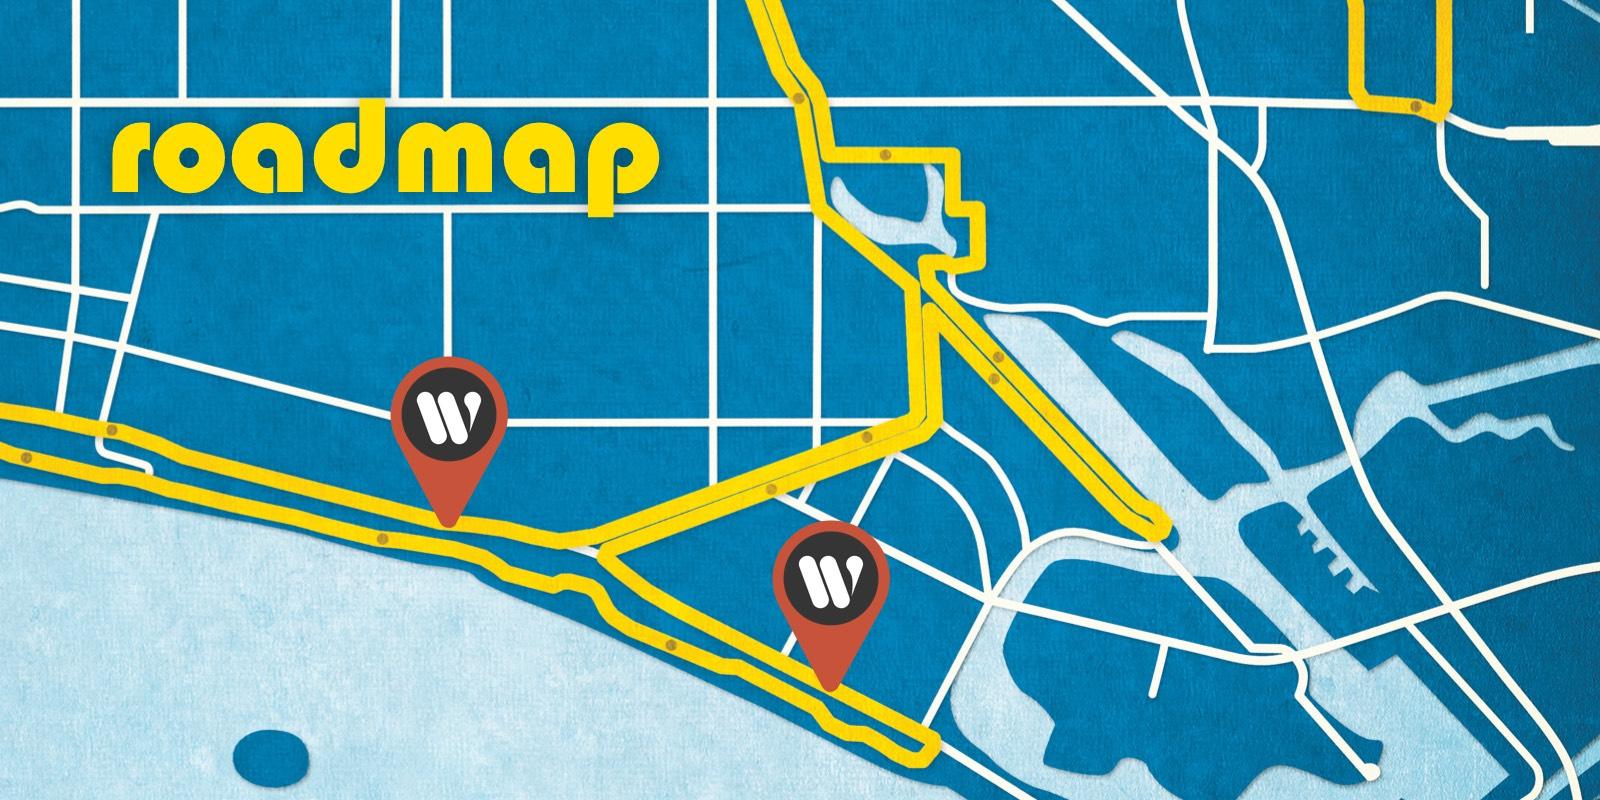 wetopi_roadmap.jpg